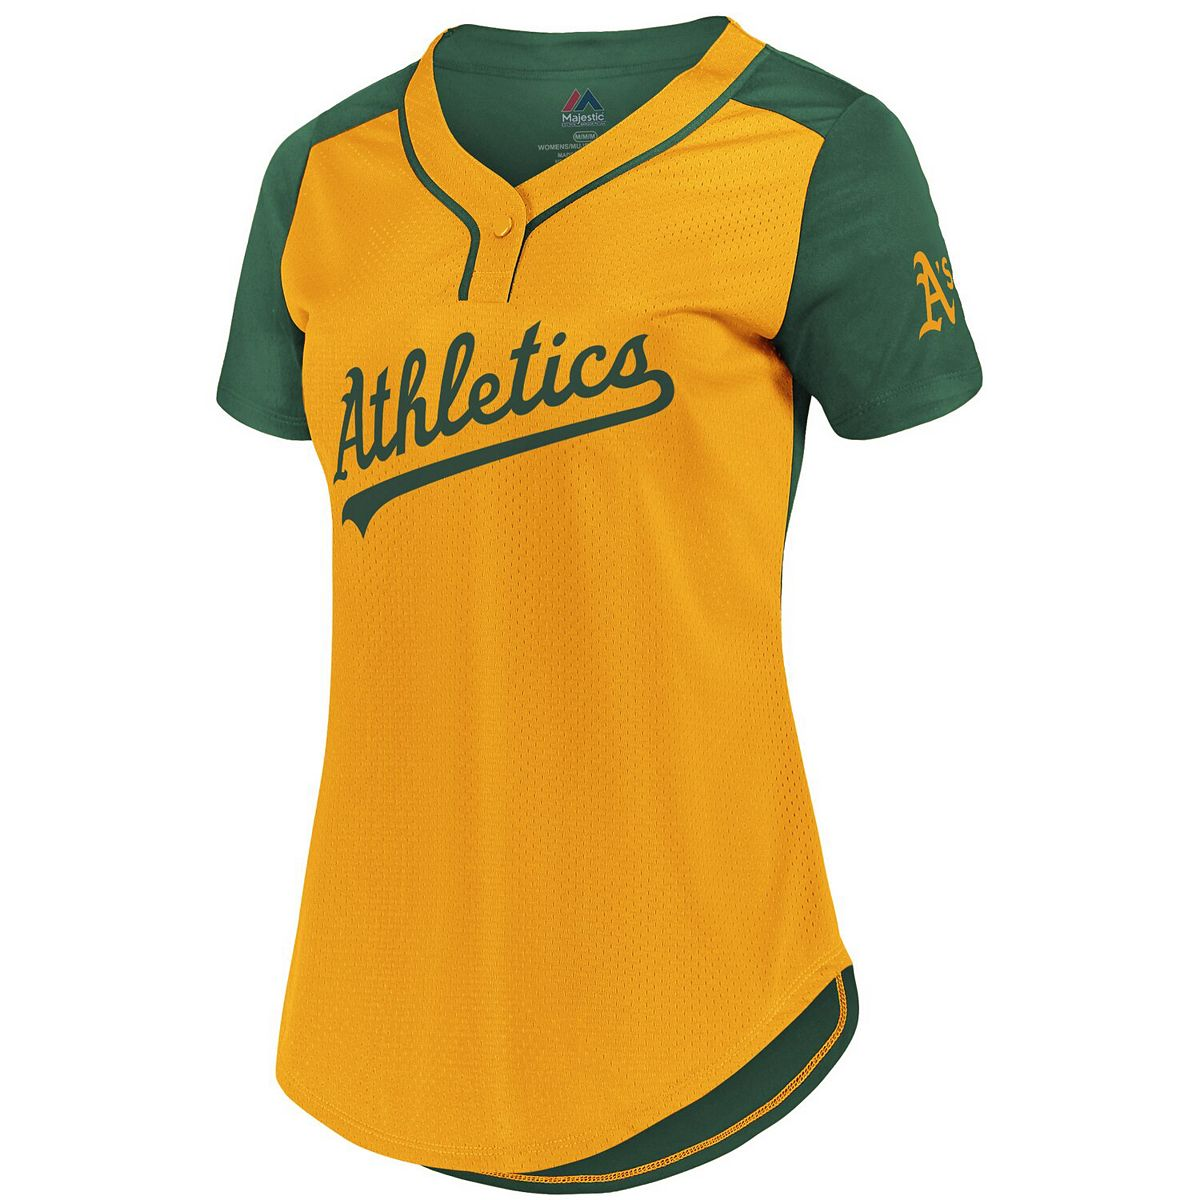 Women's Majestic Gold/Green Oakland Athletics League Diva Cool Base Mesh T-Shirt lmG7F